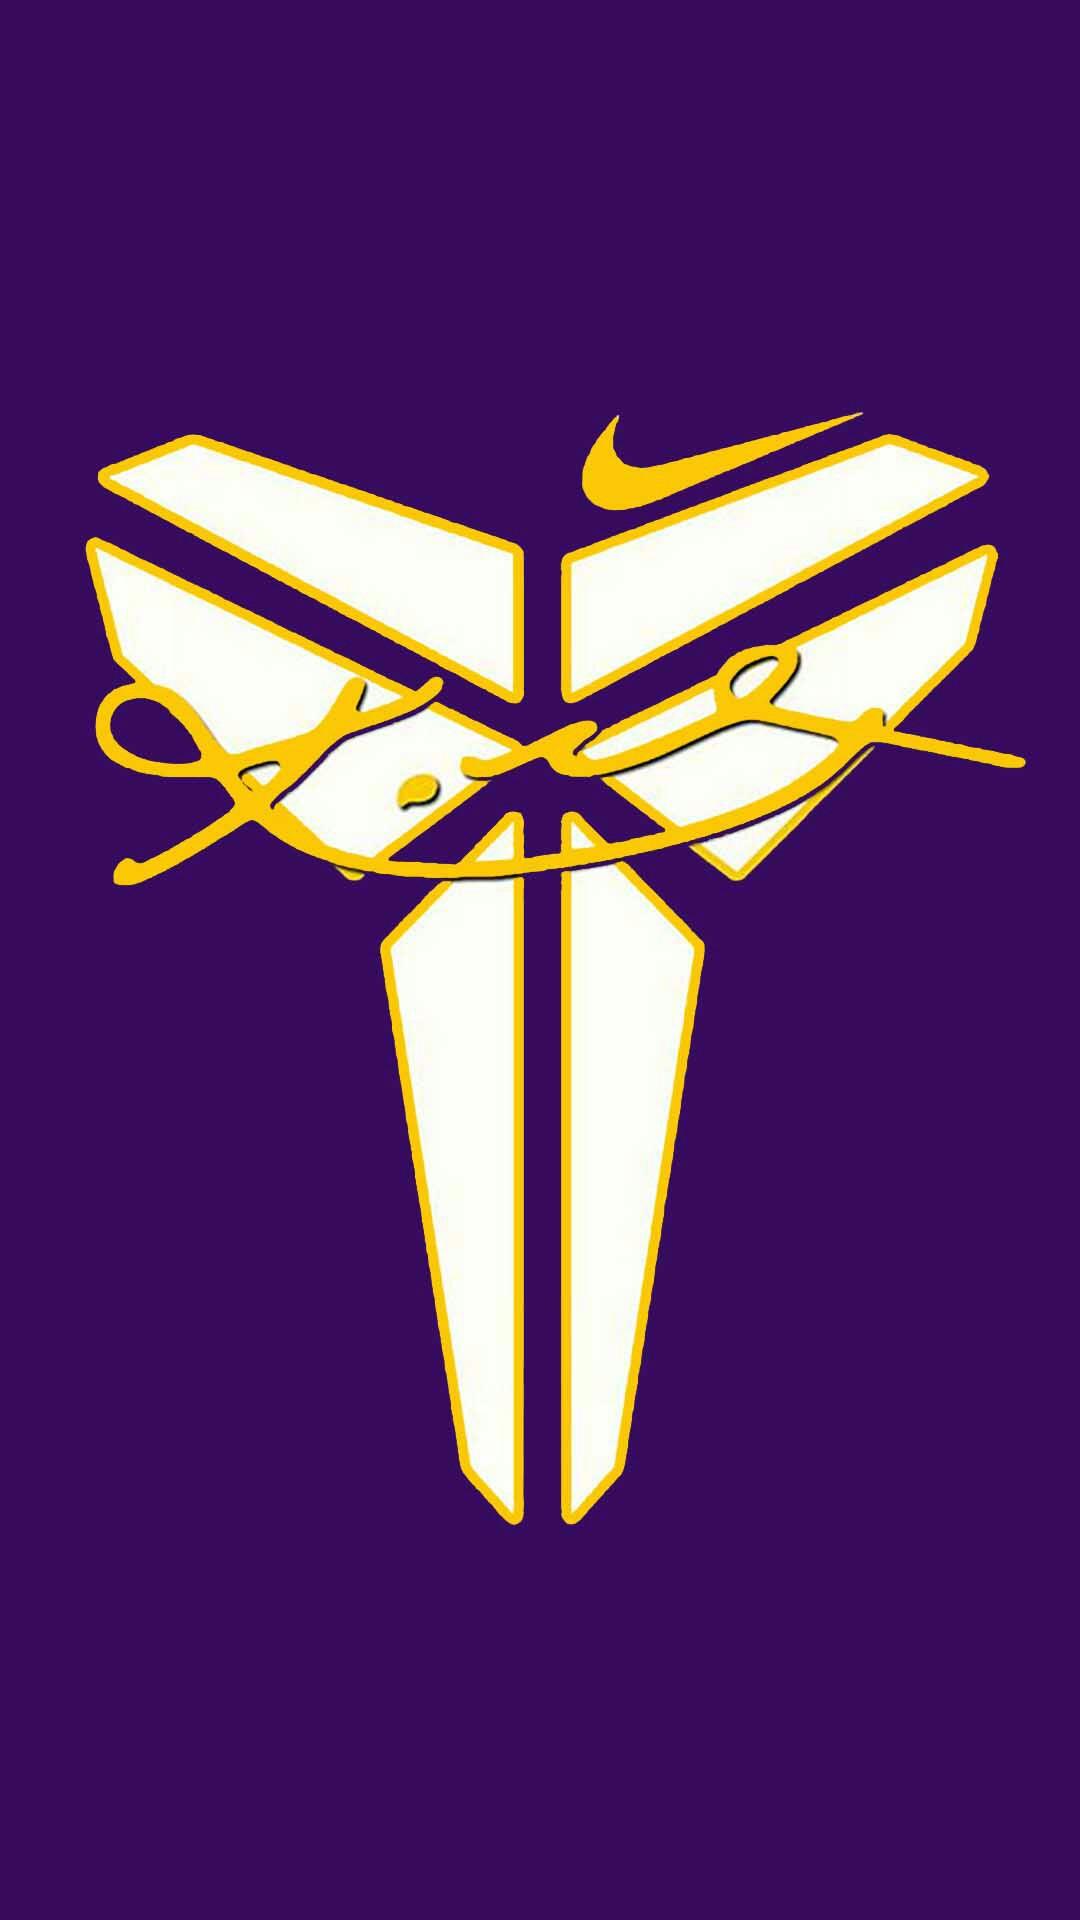 Bryant Logos